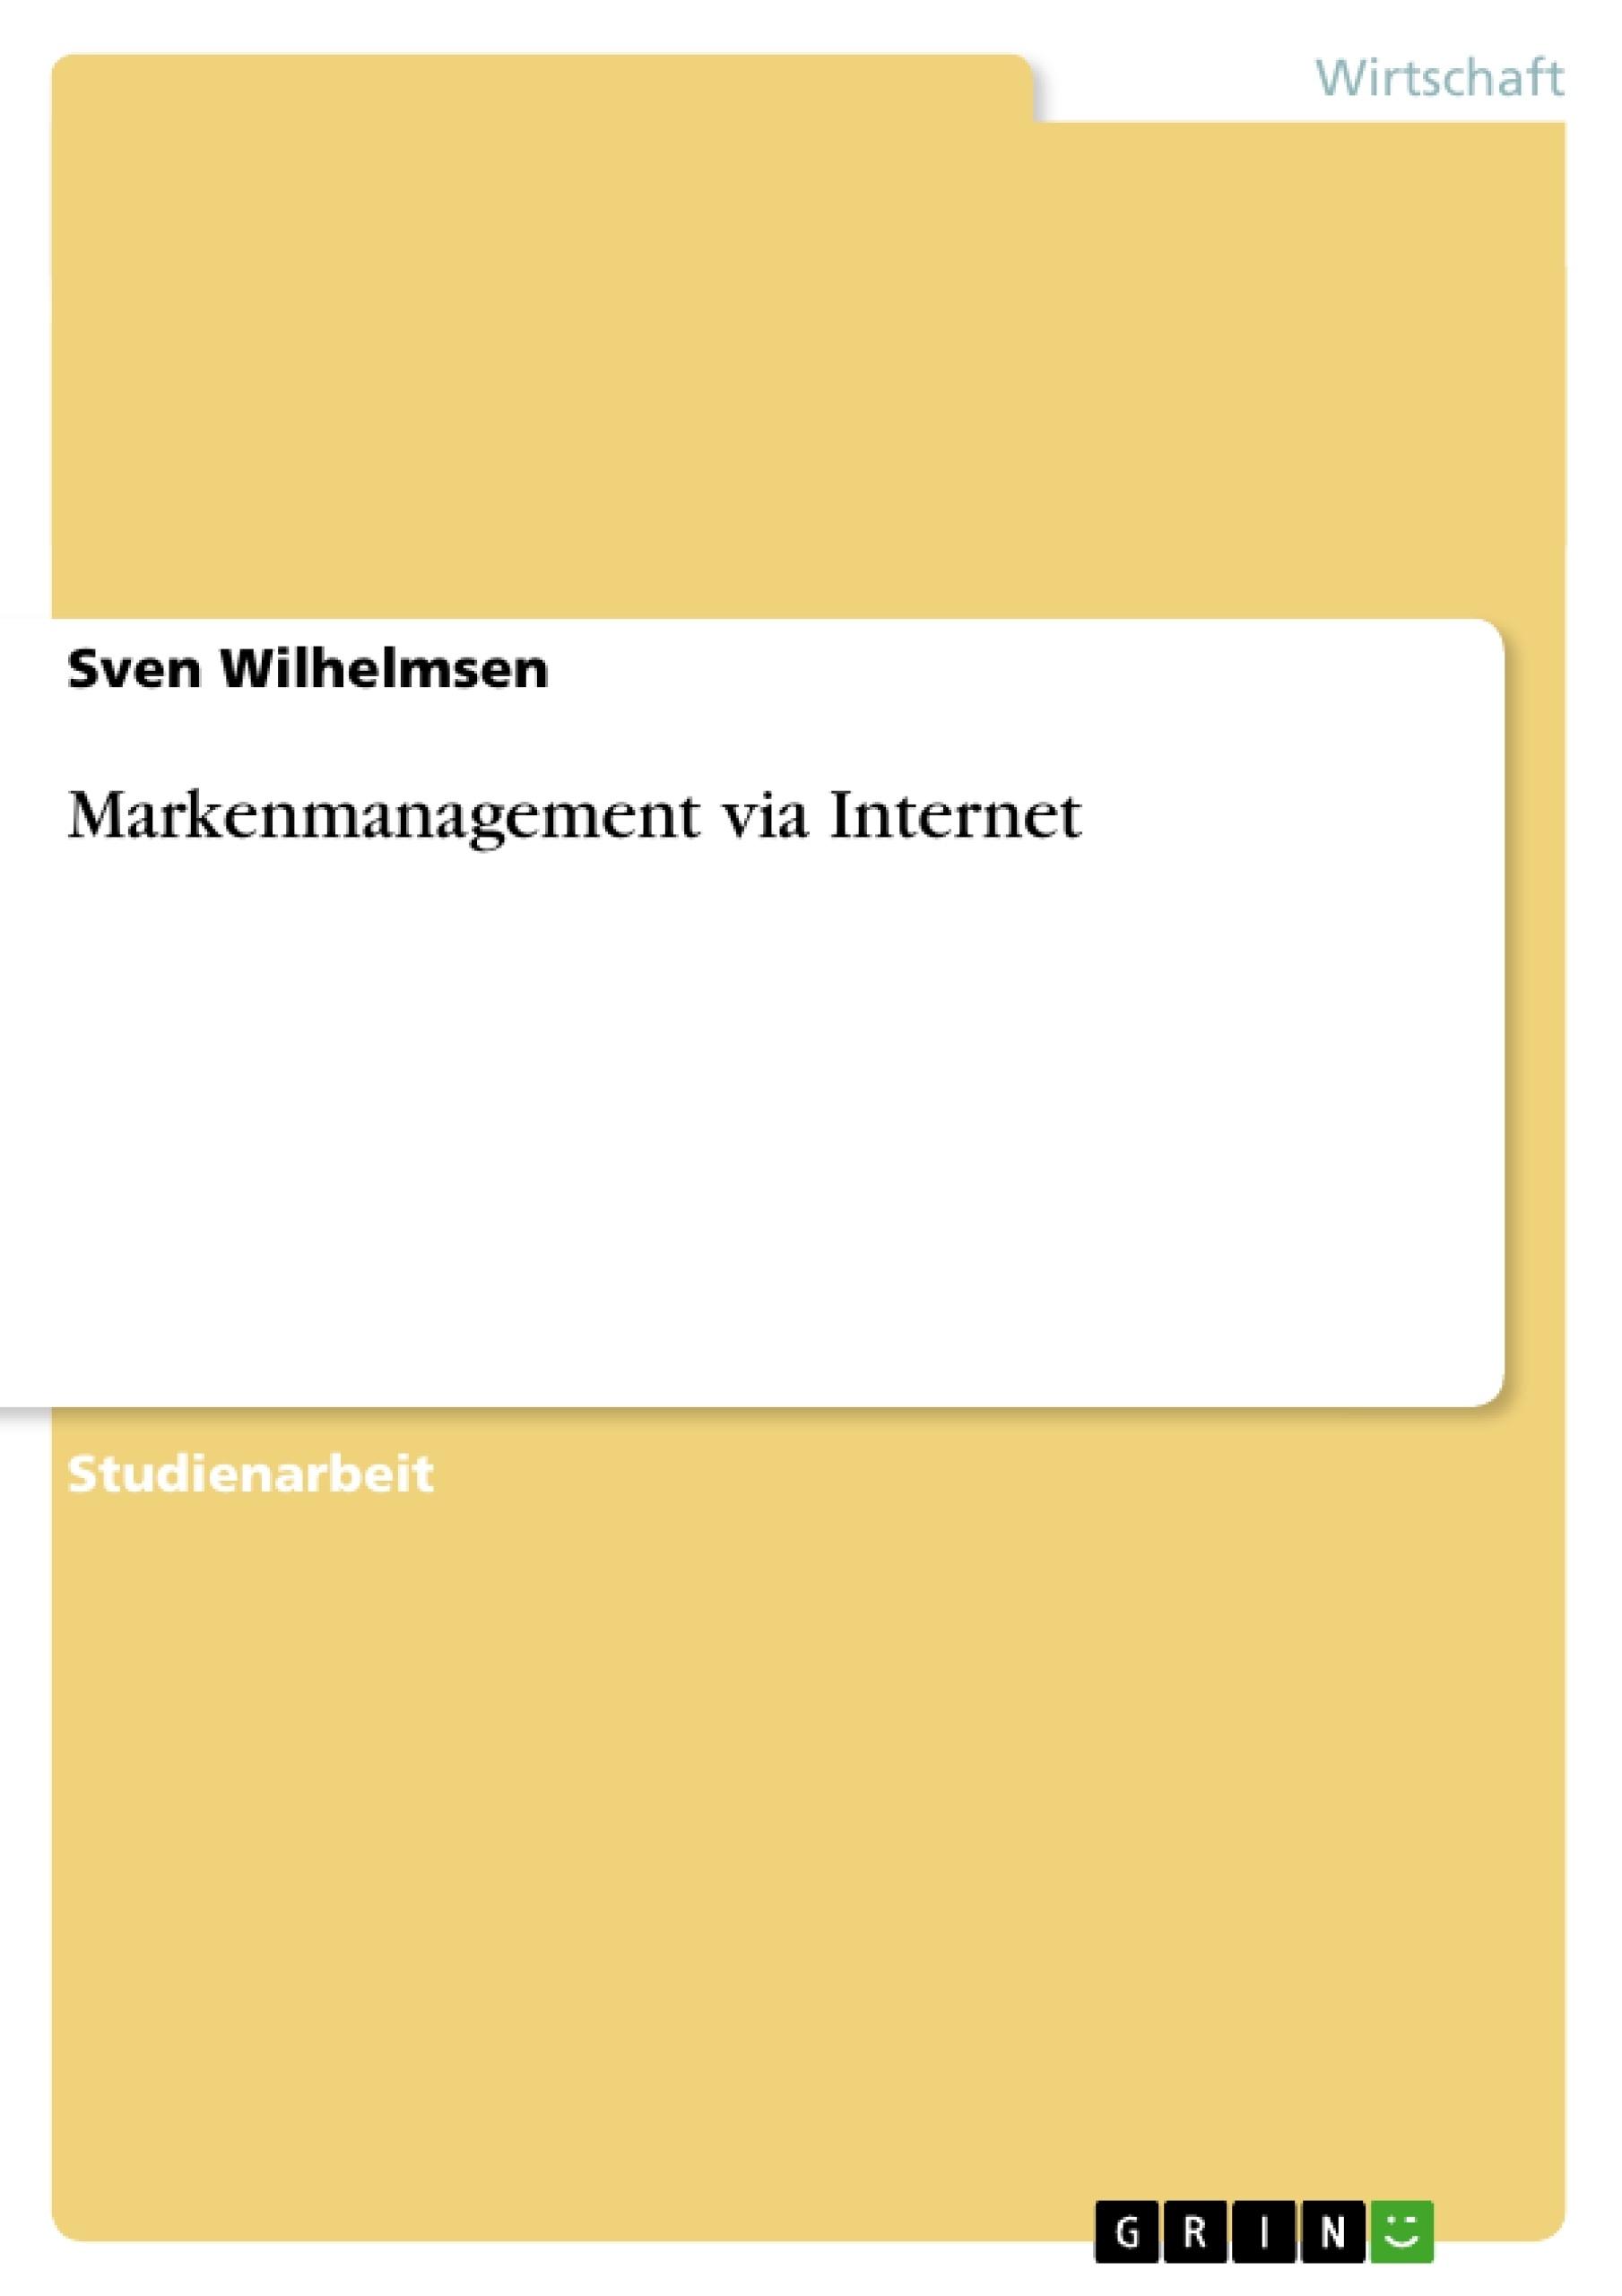 Titel: Markenmanagement via Internet